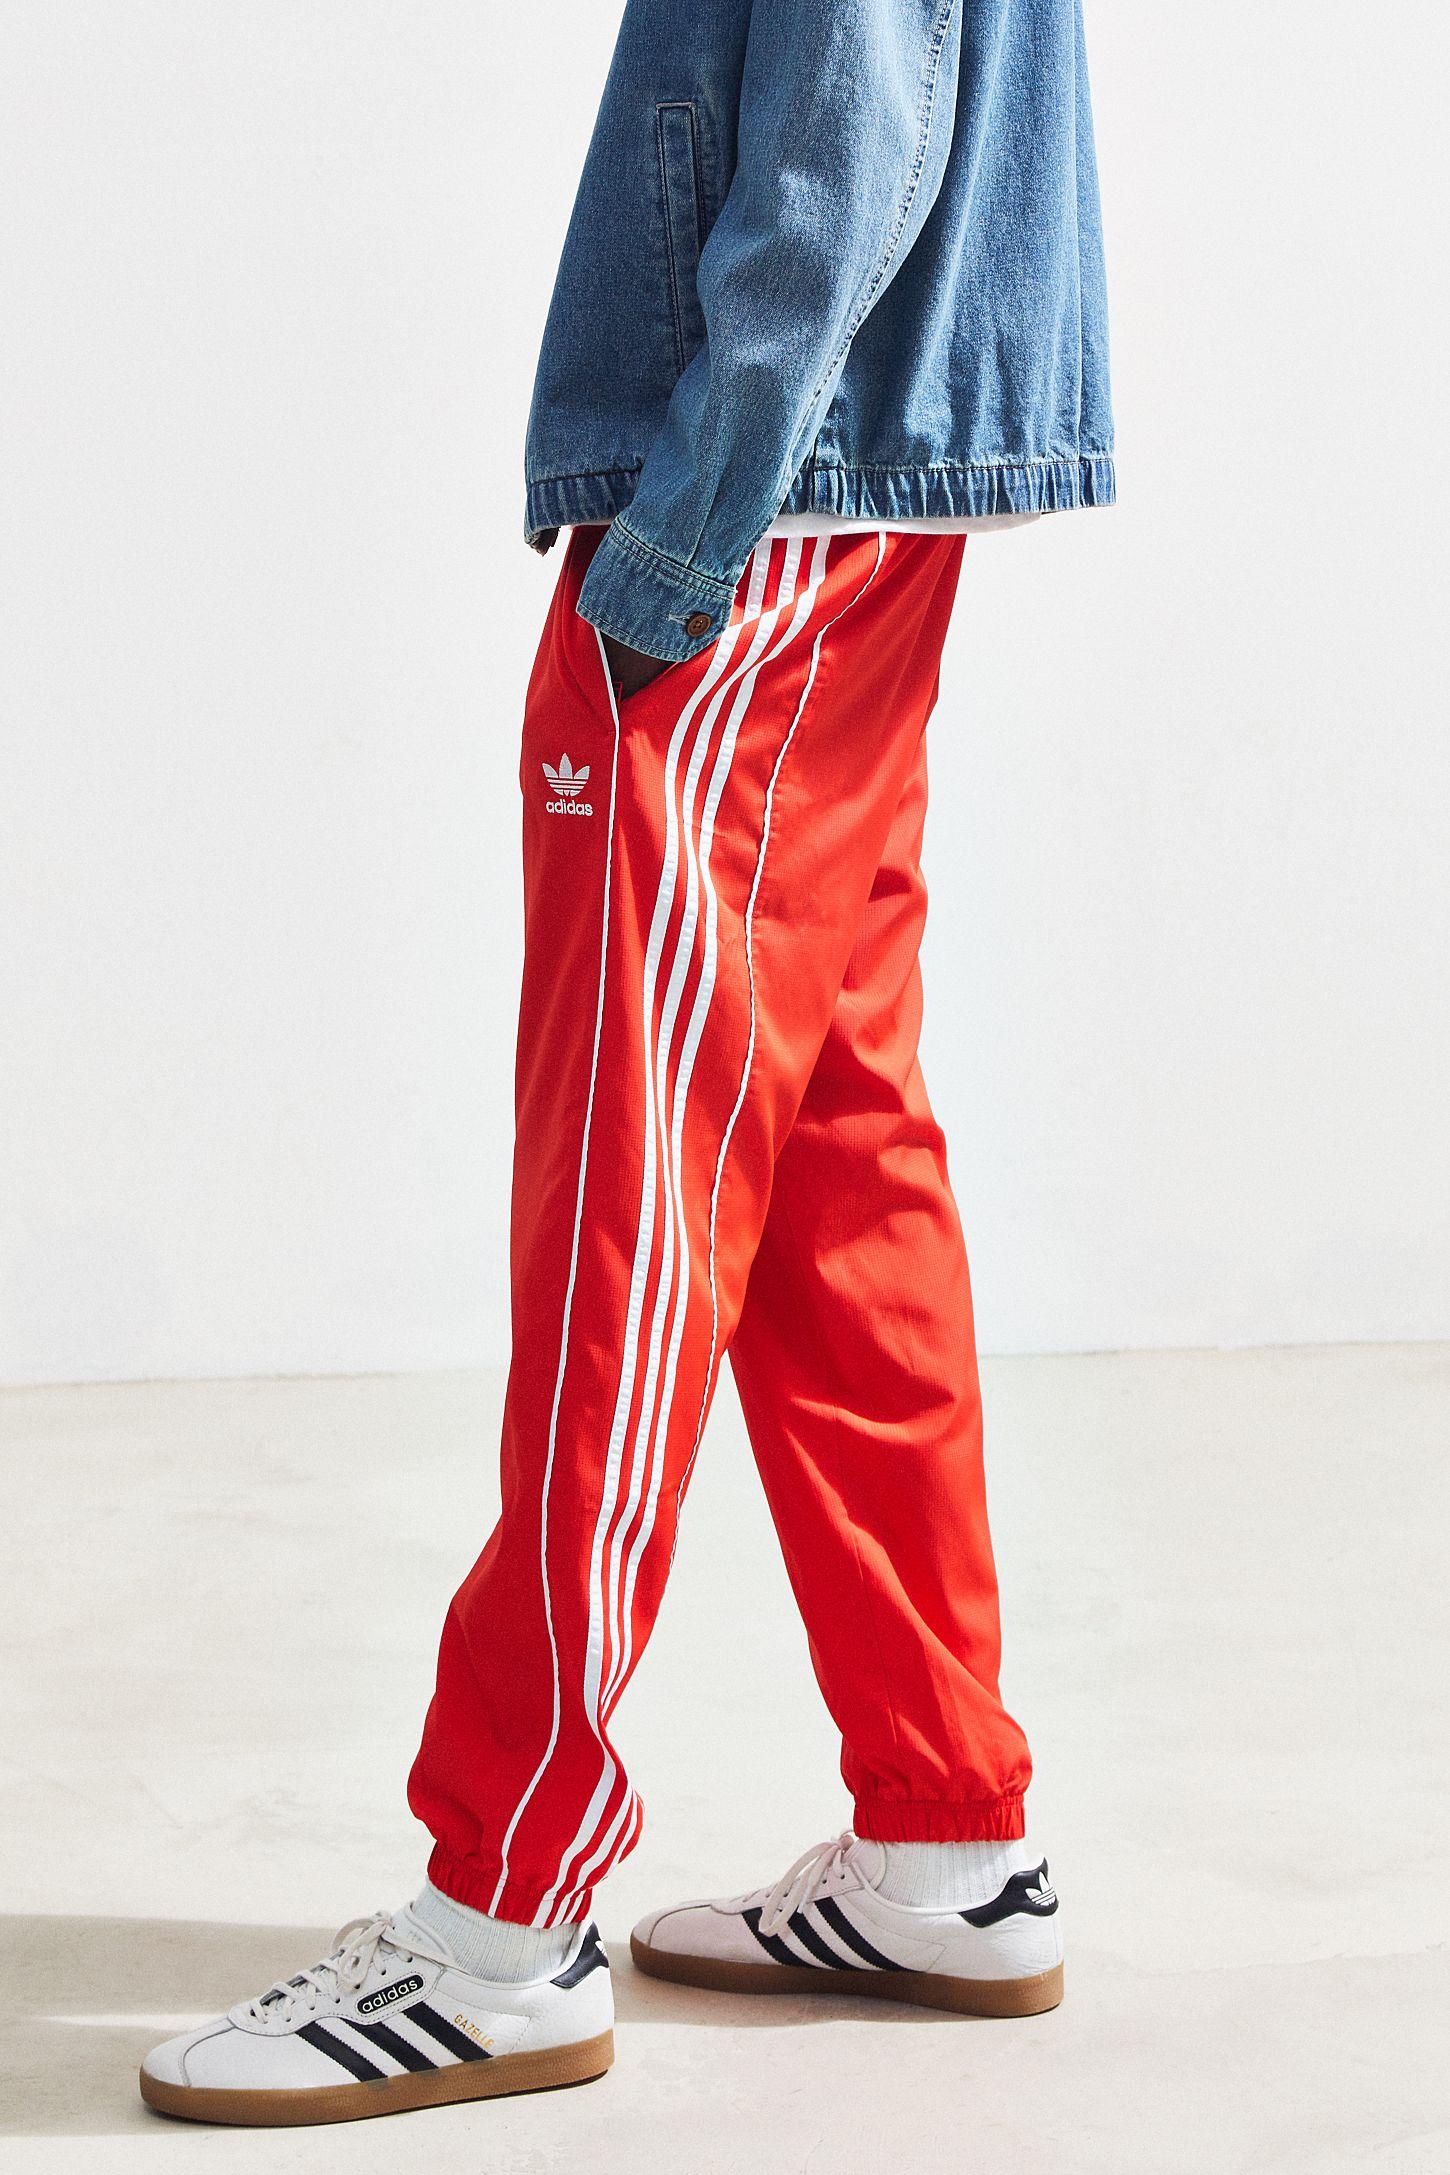 8a88f3e2 adidas Authentic Jogger Wind Pant